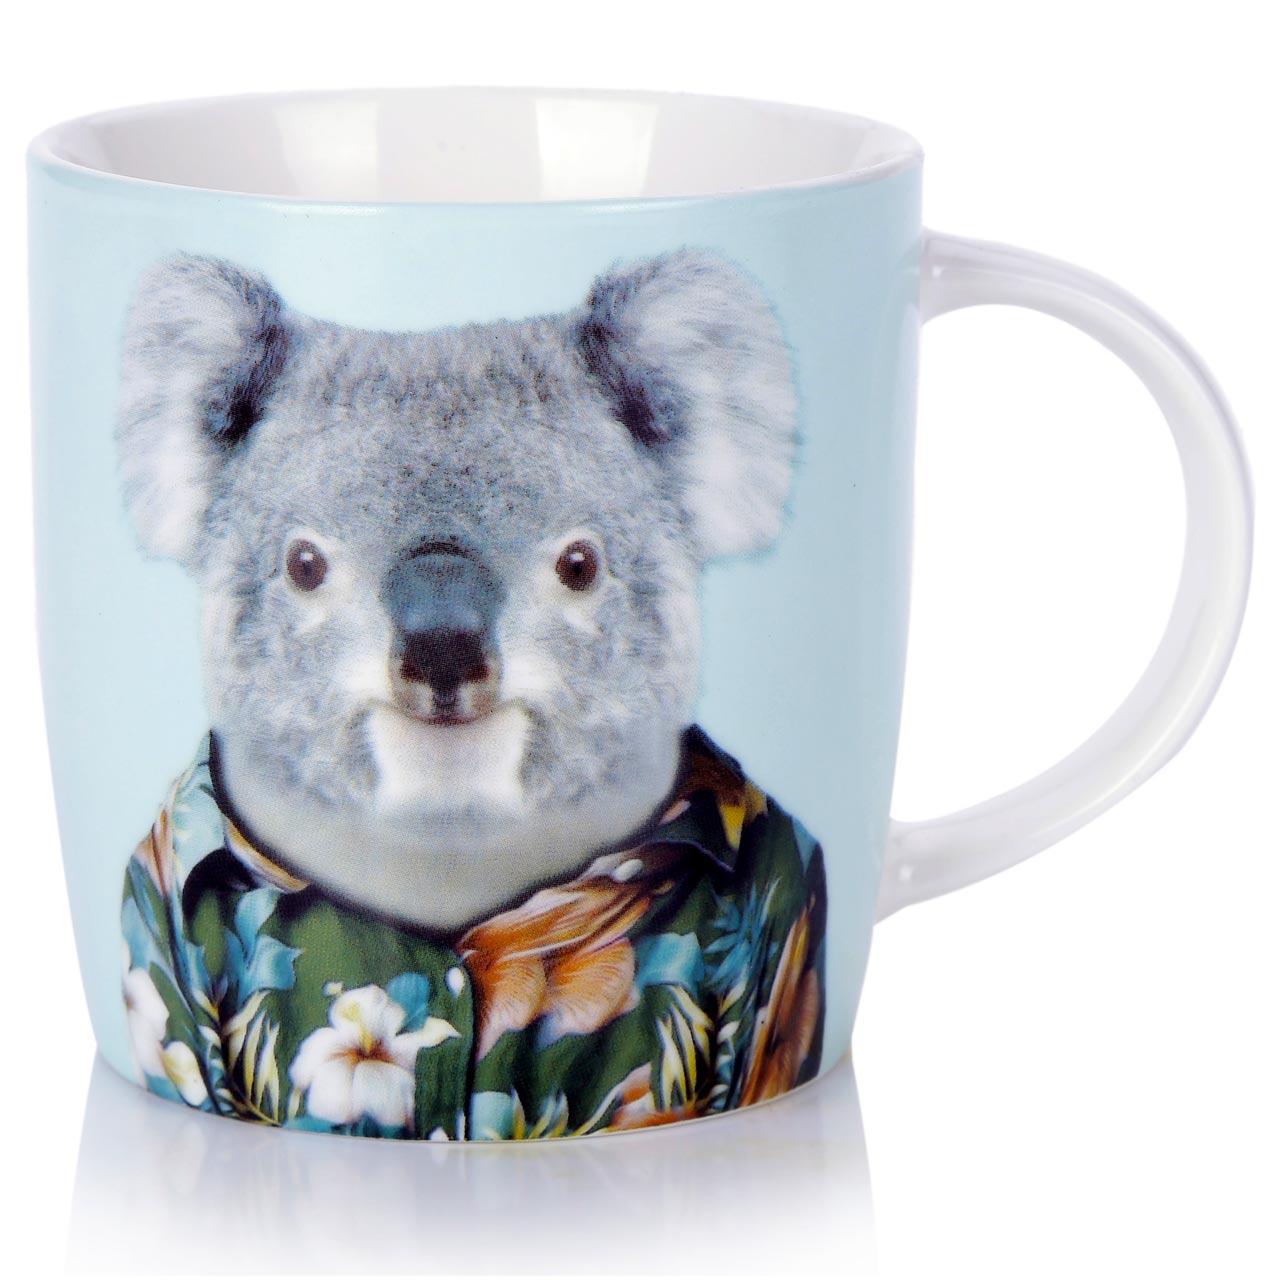 Porcelain Coffee and Tea Mug Koala | The Design Gift Shop